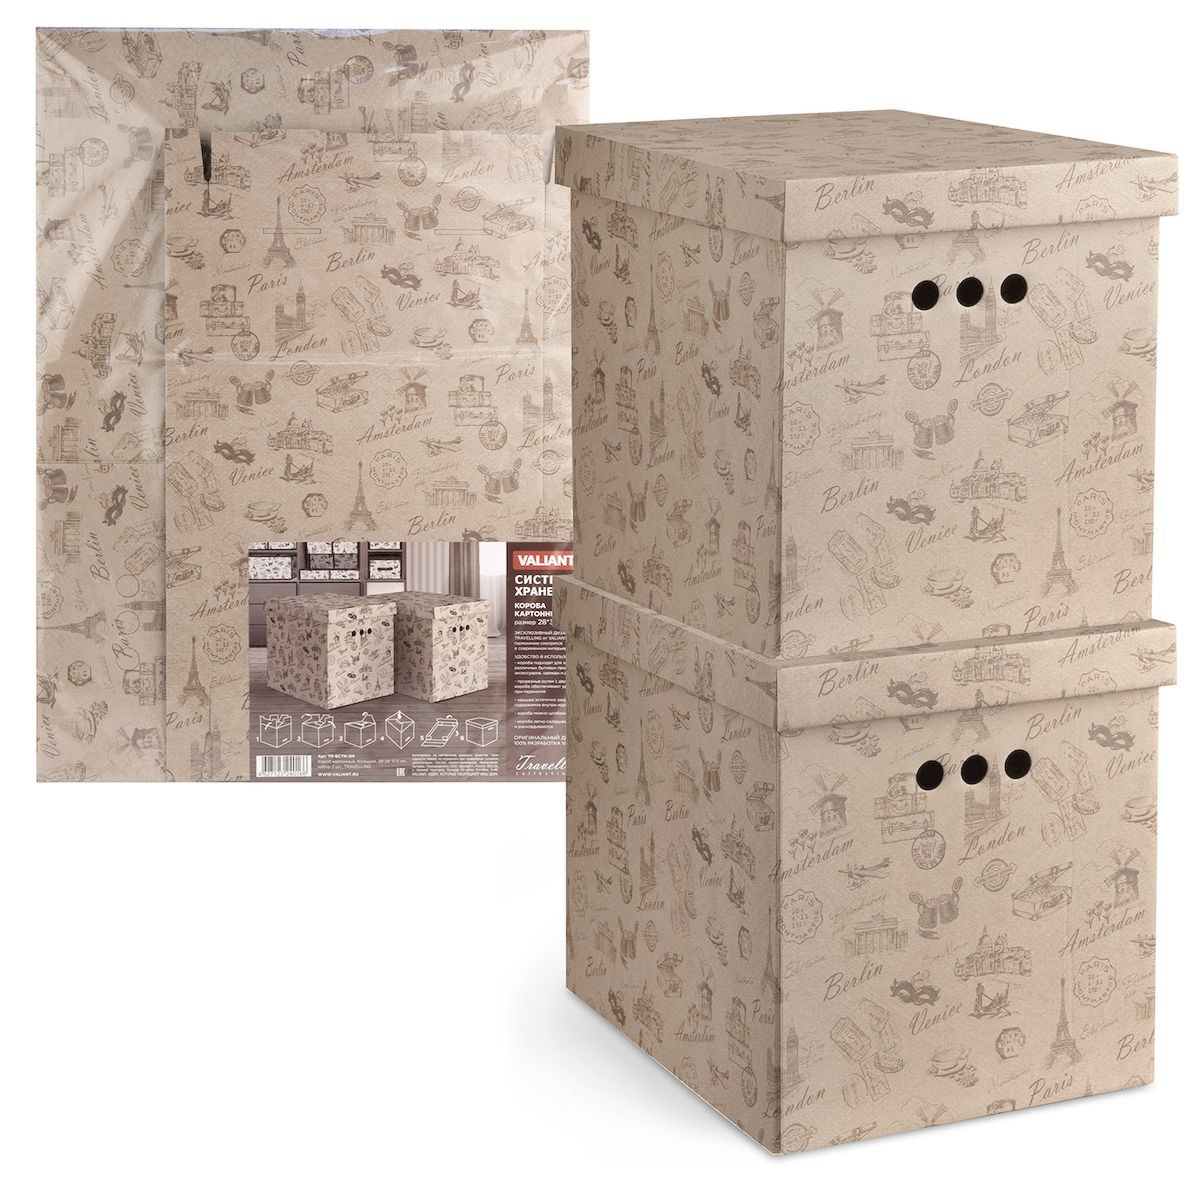 Короб для хранения Valiant Travelling, складной, 28 х 38 х 31,5 см, 2 шт коробка для хранения valiant travelling складная 25 х 33 х 18 5 см 2 шт